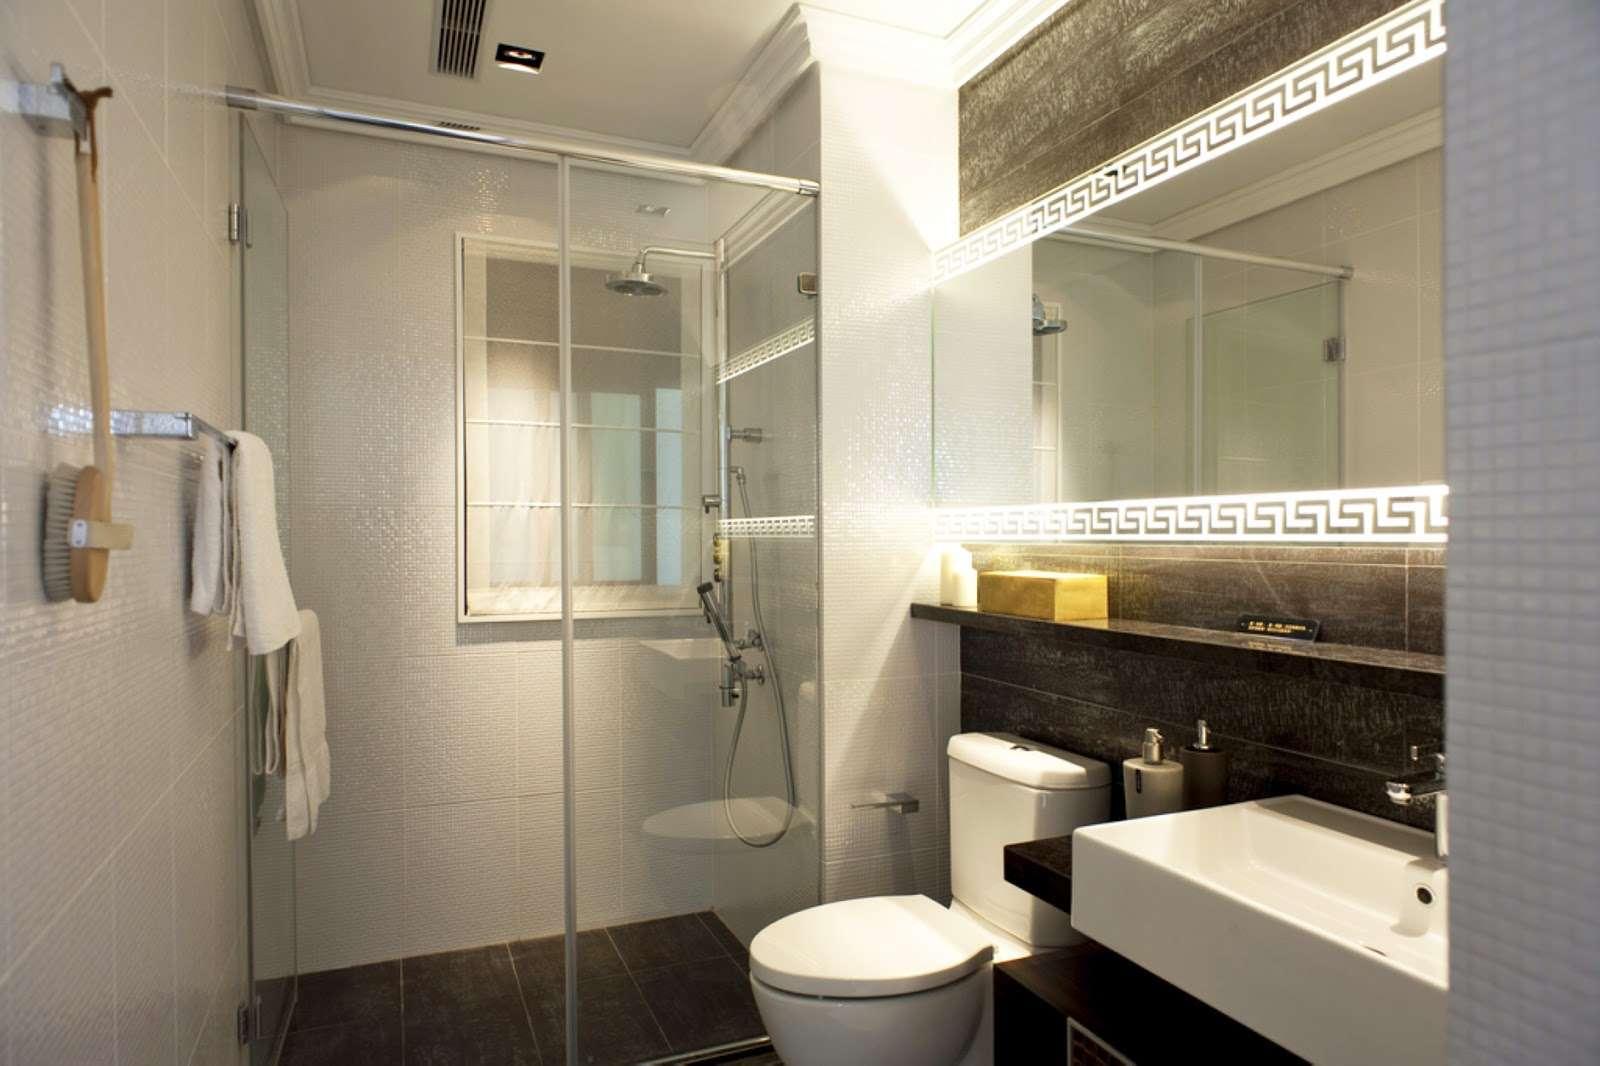 Ensuite Bathroom Ideas Revisited Industry Standard Design